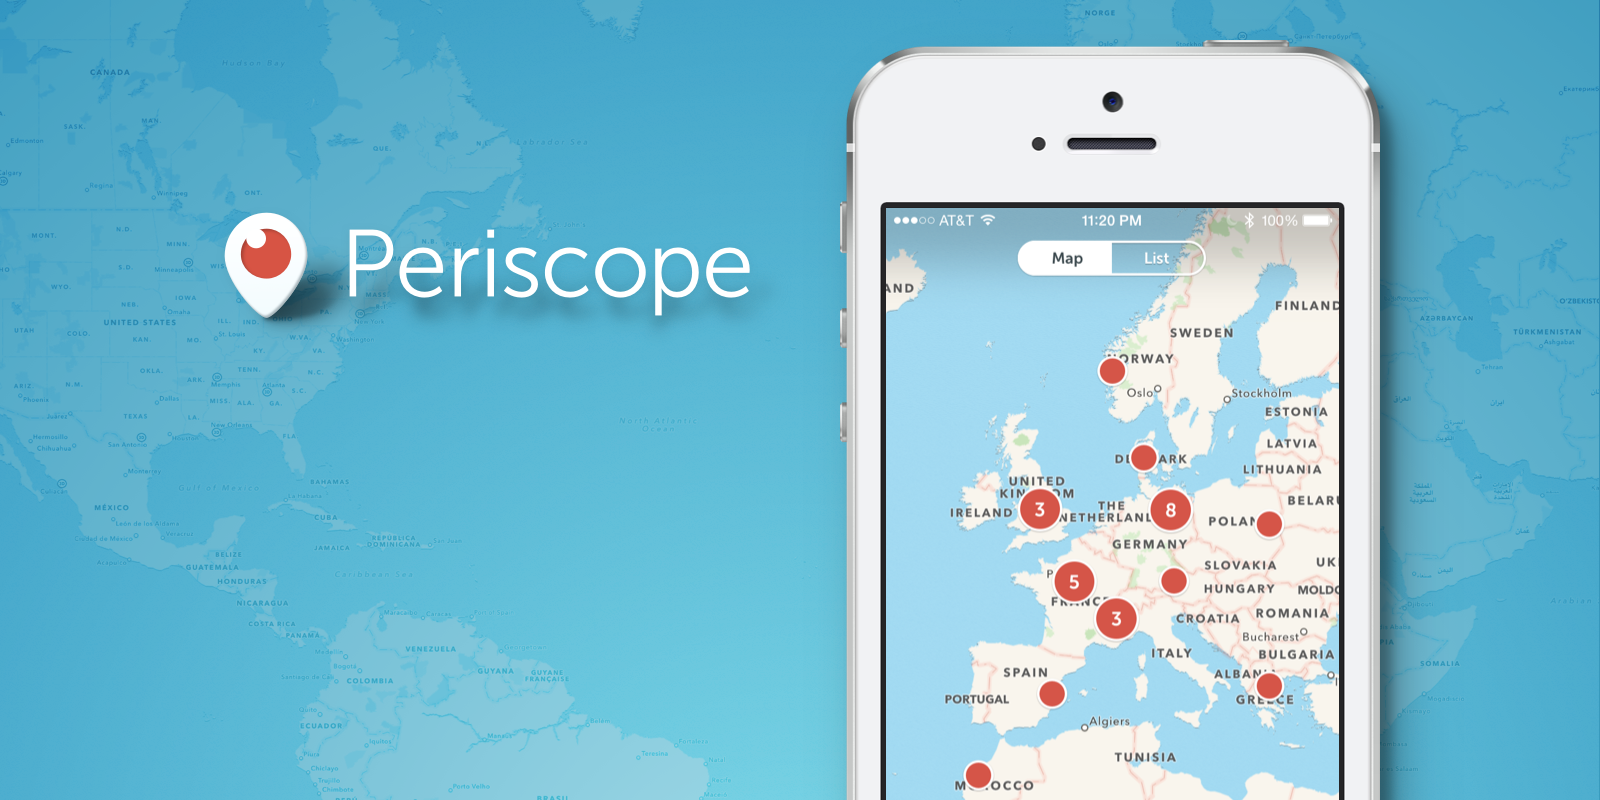 periscope map view